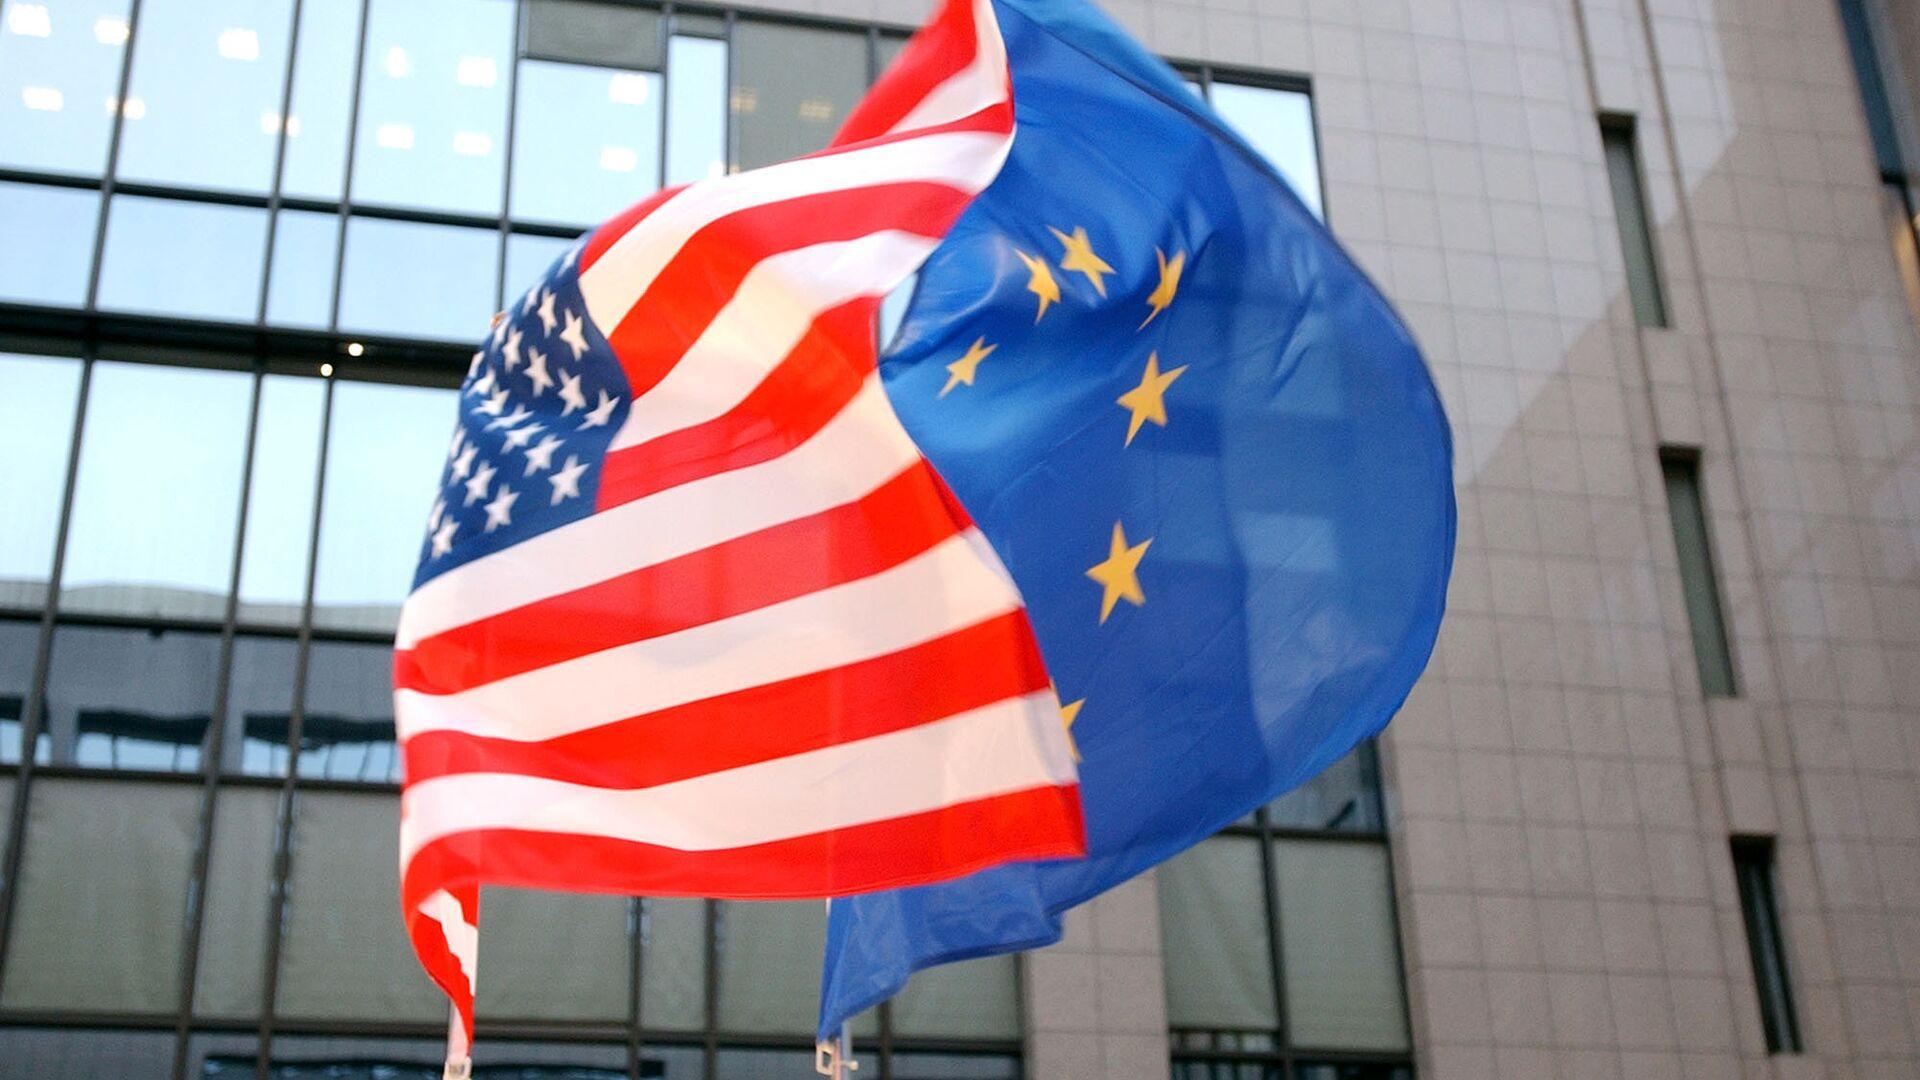 Флаги ЕС и США на здании Европейского парламента в Брюсселе  - РИА Новости, 1920, 10.04.2021